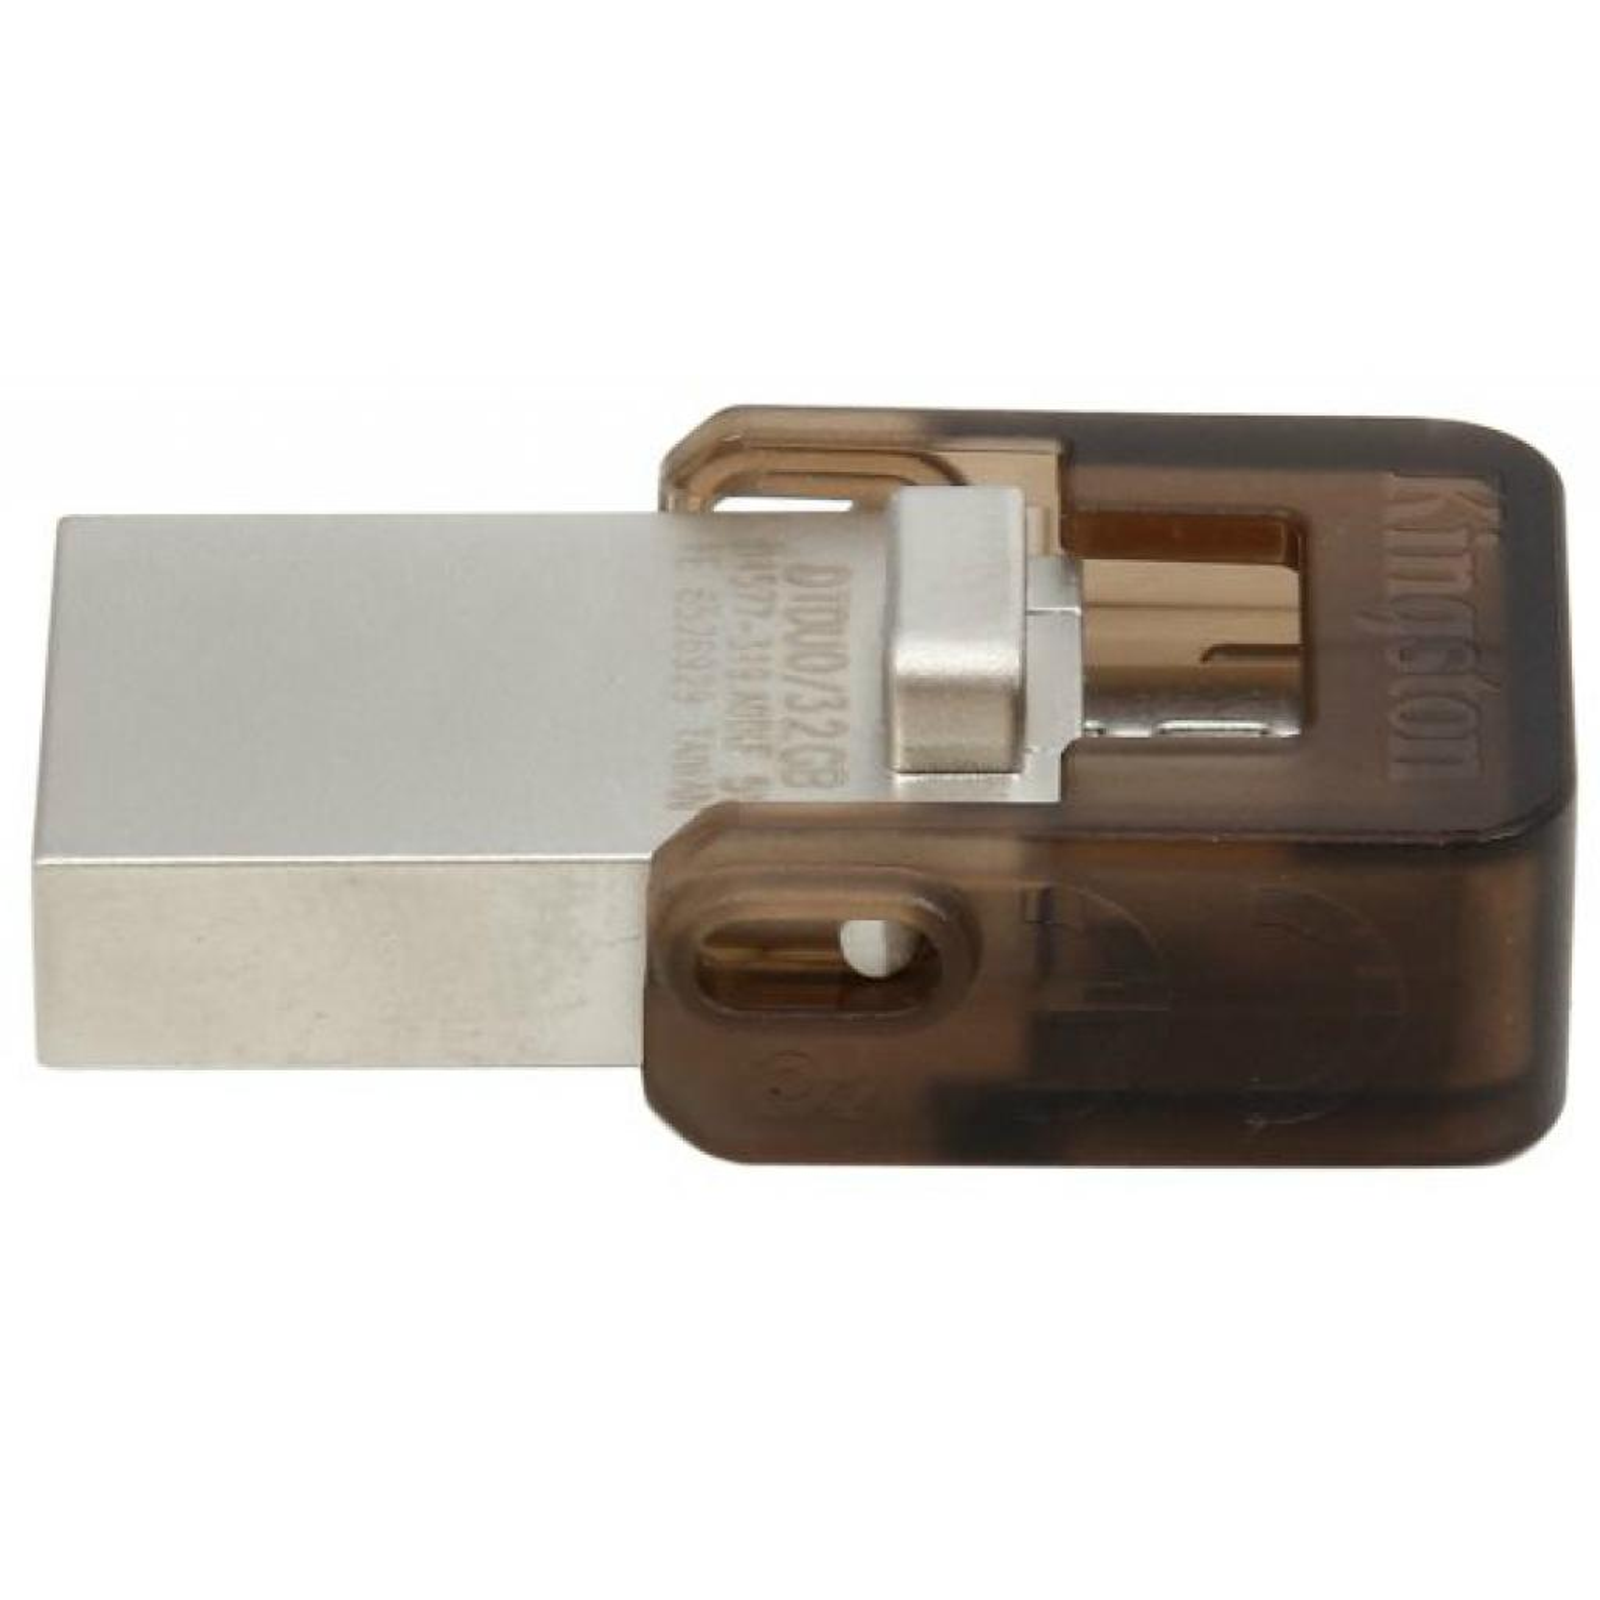 USB флеш накопитель Kingston 32Gb DT MicroDuo (DTDUO/32GB) изображение 4